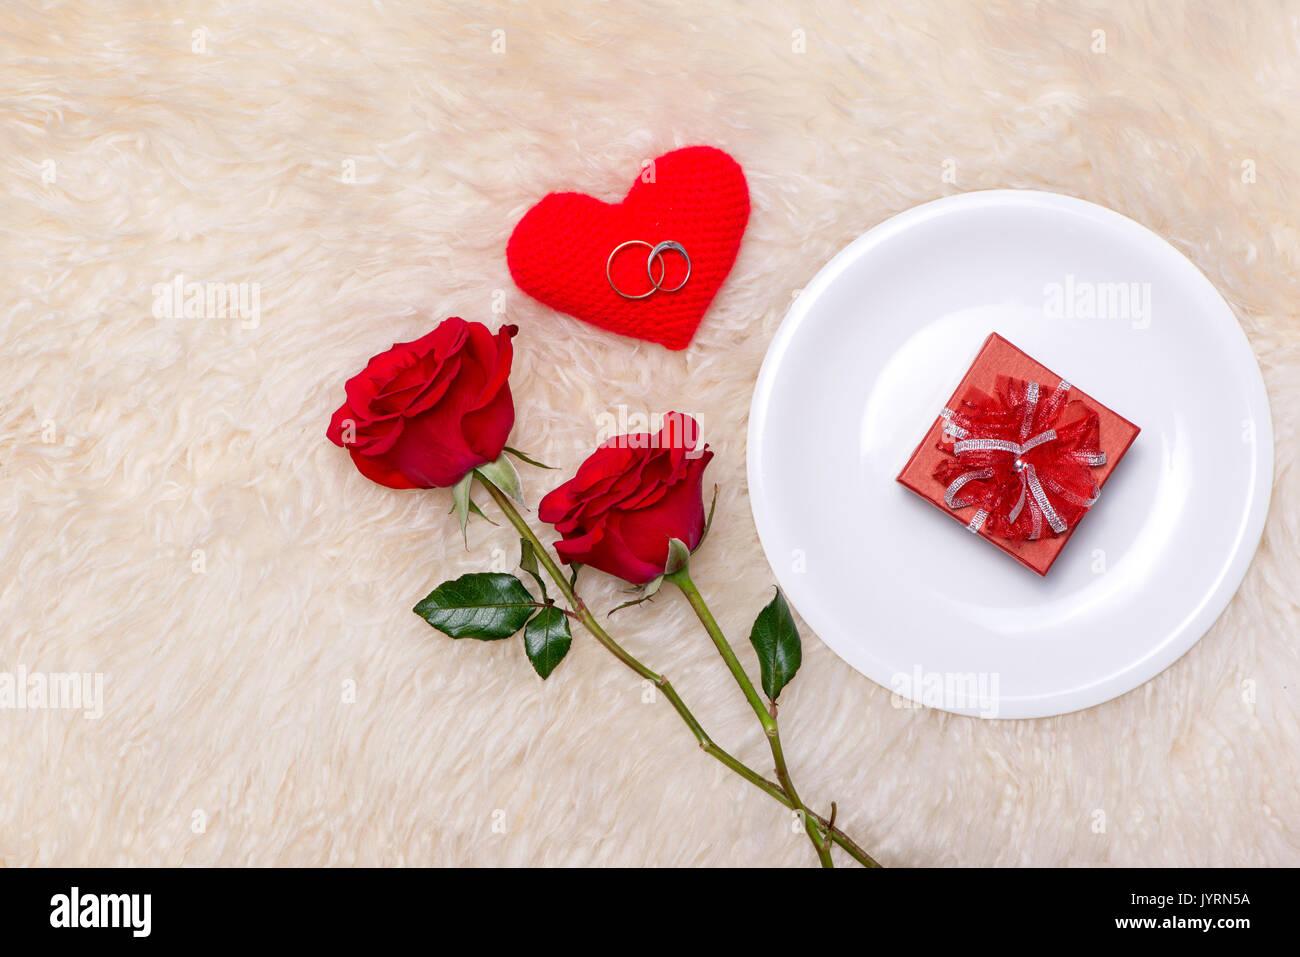 Astonishing Valentines Table Setting Ideas - Best Image Engine ...